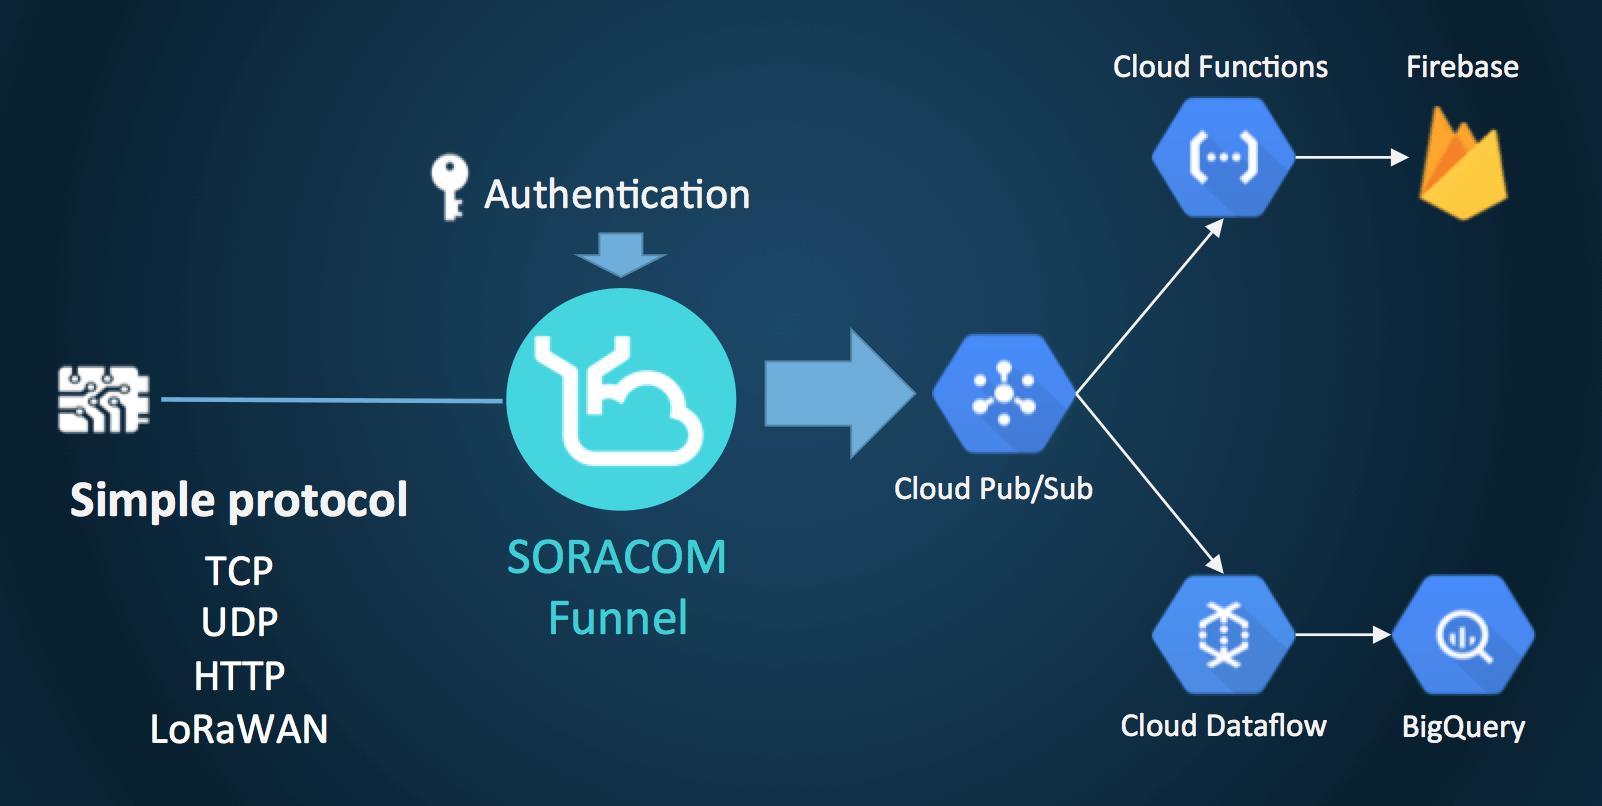 Soracom IoT explands service to support Google Cloud